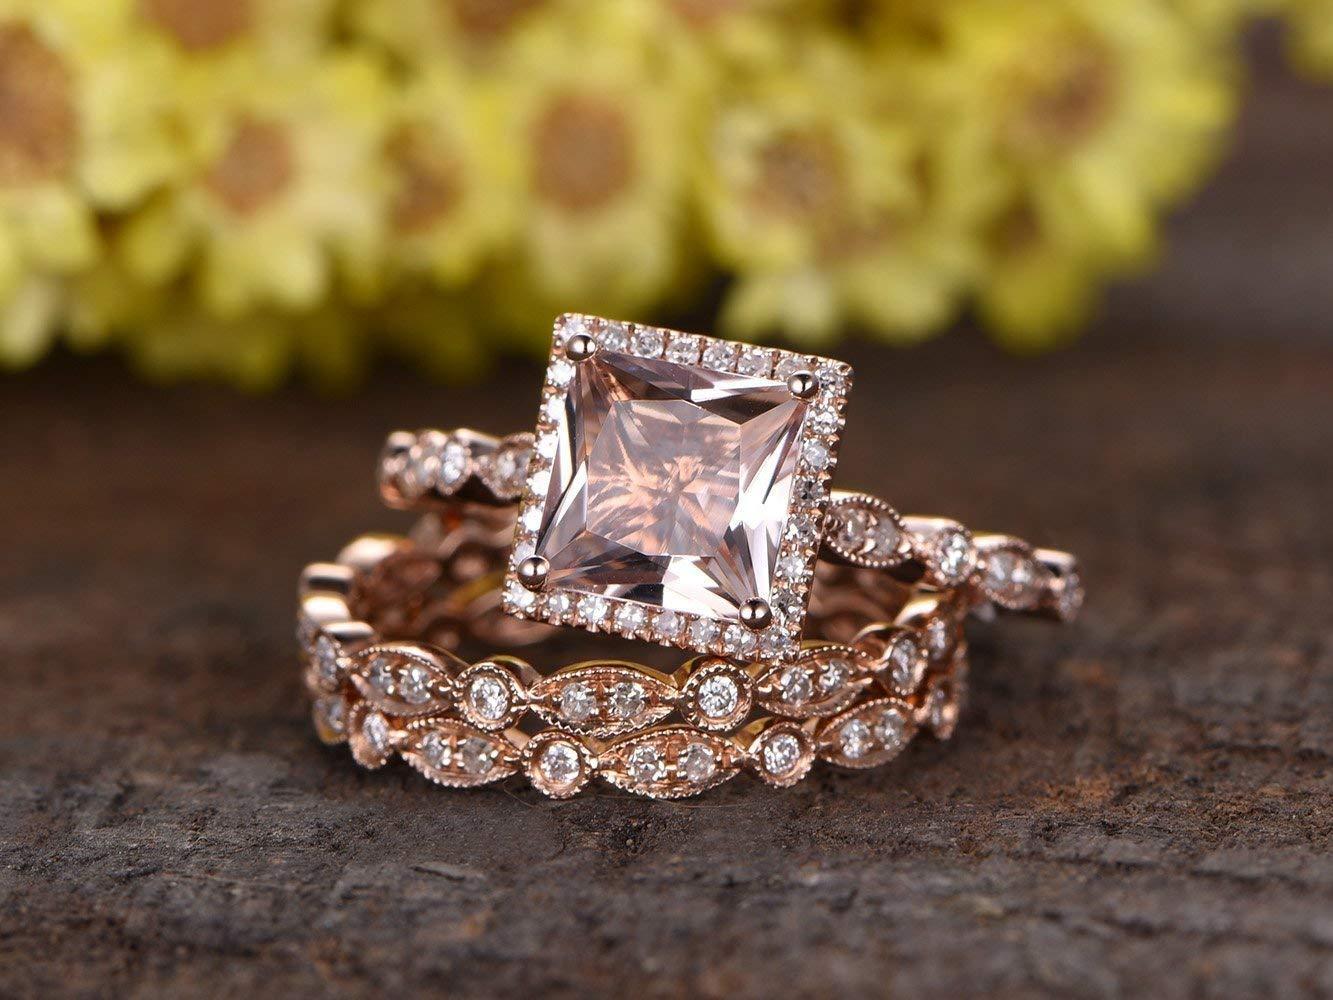 Amazon Com 3pcs Diamond Rings Set 8mm Princess Cut Vs Pink Morganite Solid 14k Rose Gold Ball Prong Halo Bridal Engagement Ring Full Eternity Marquise Milgrain Art Deco Wedding Band Sets Handmade